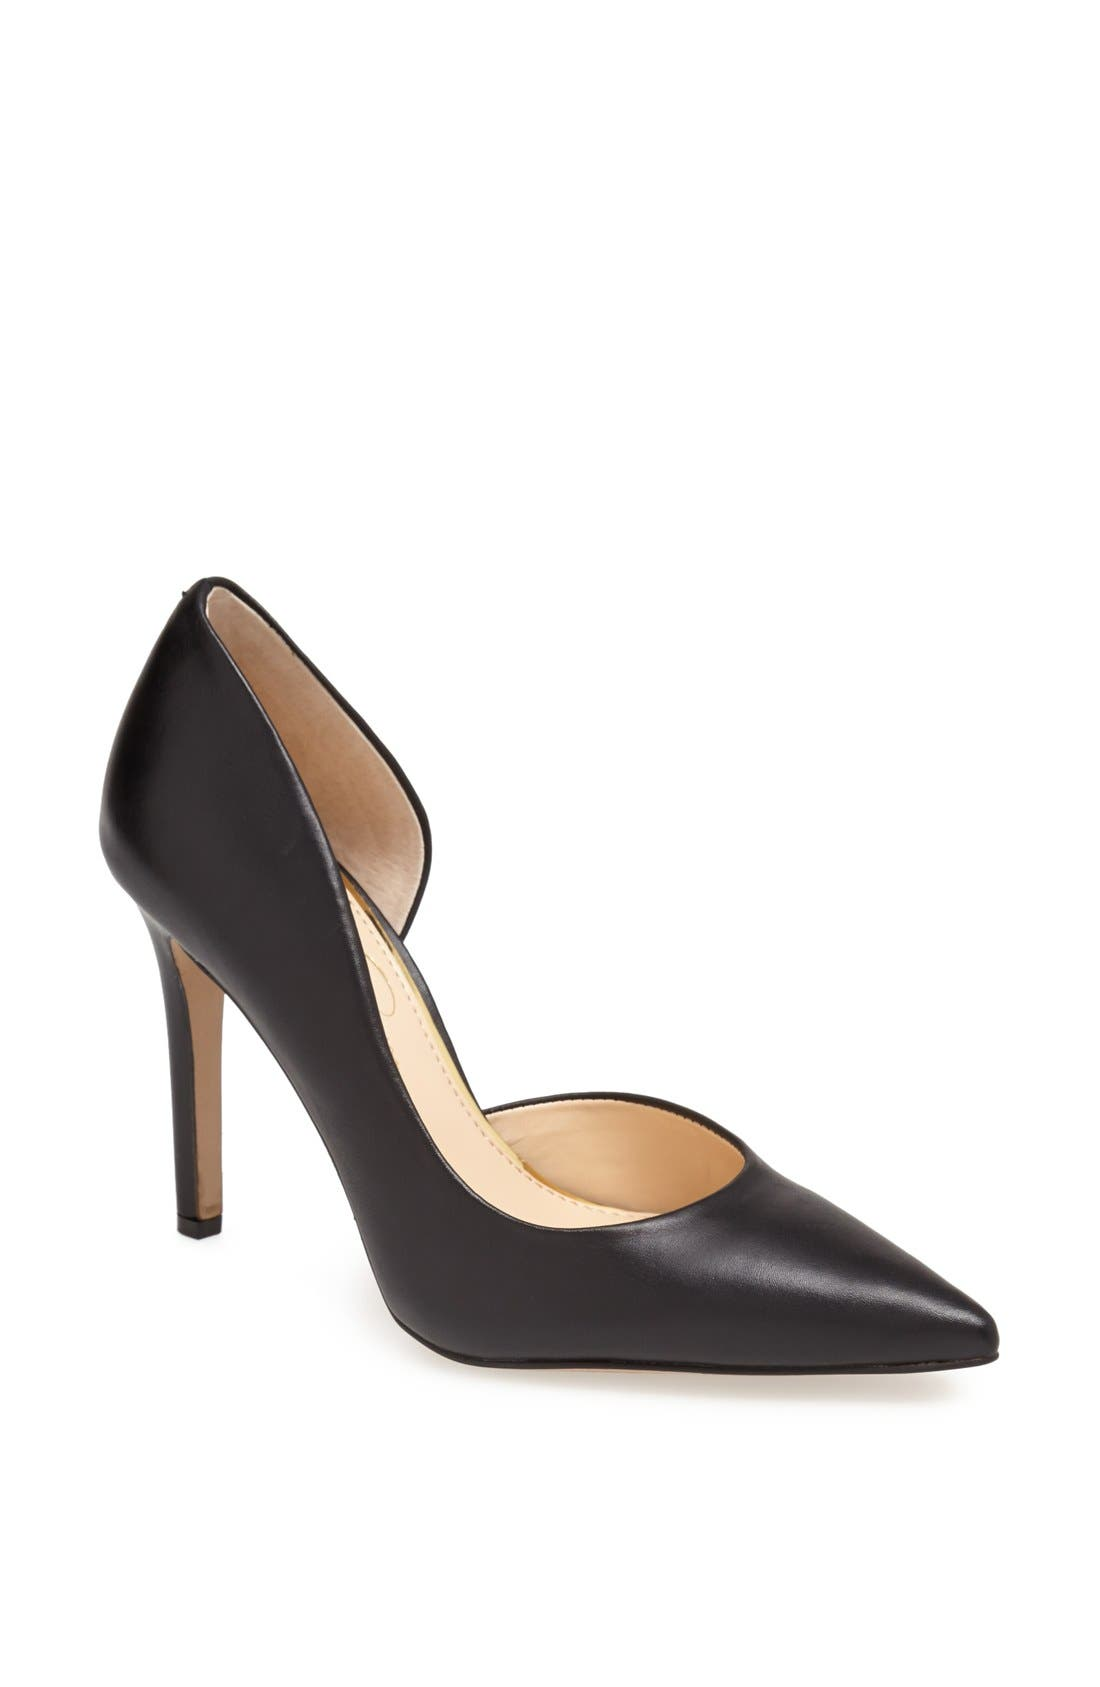 9ed3b174910 Jessica Simpson Women s Shoes